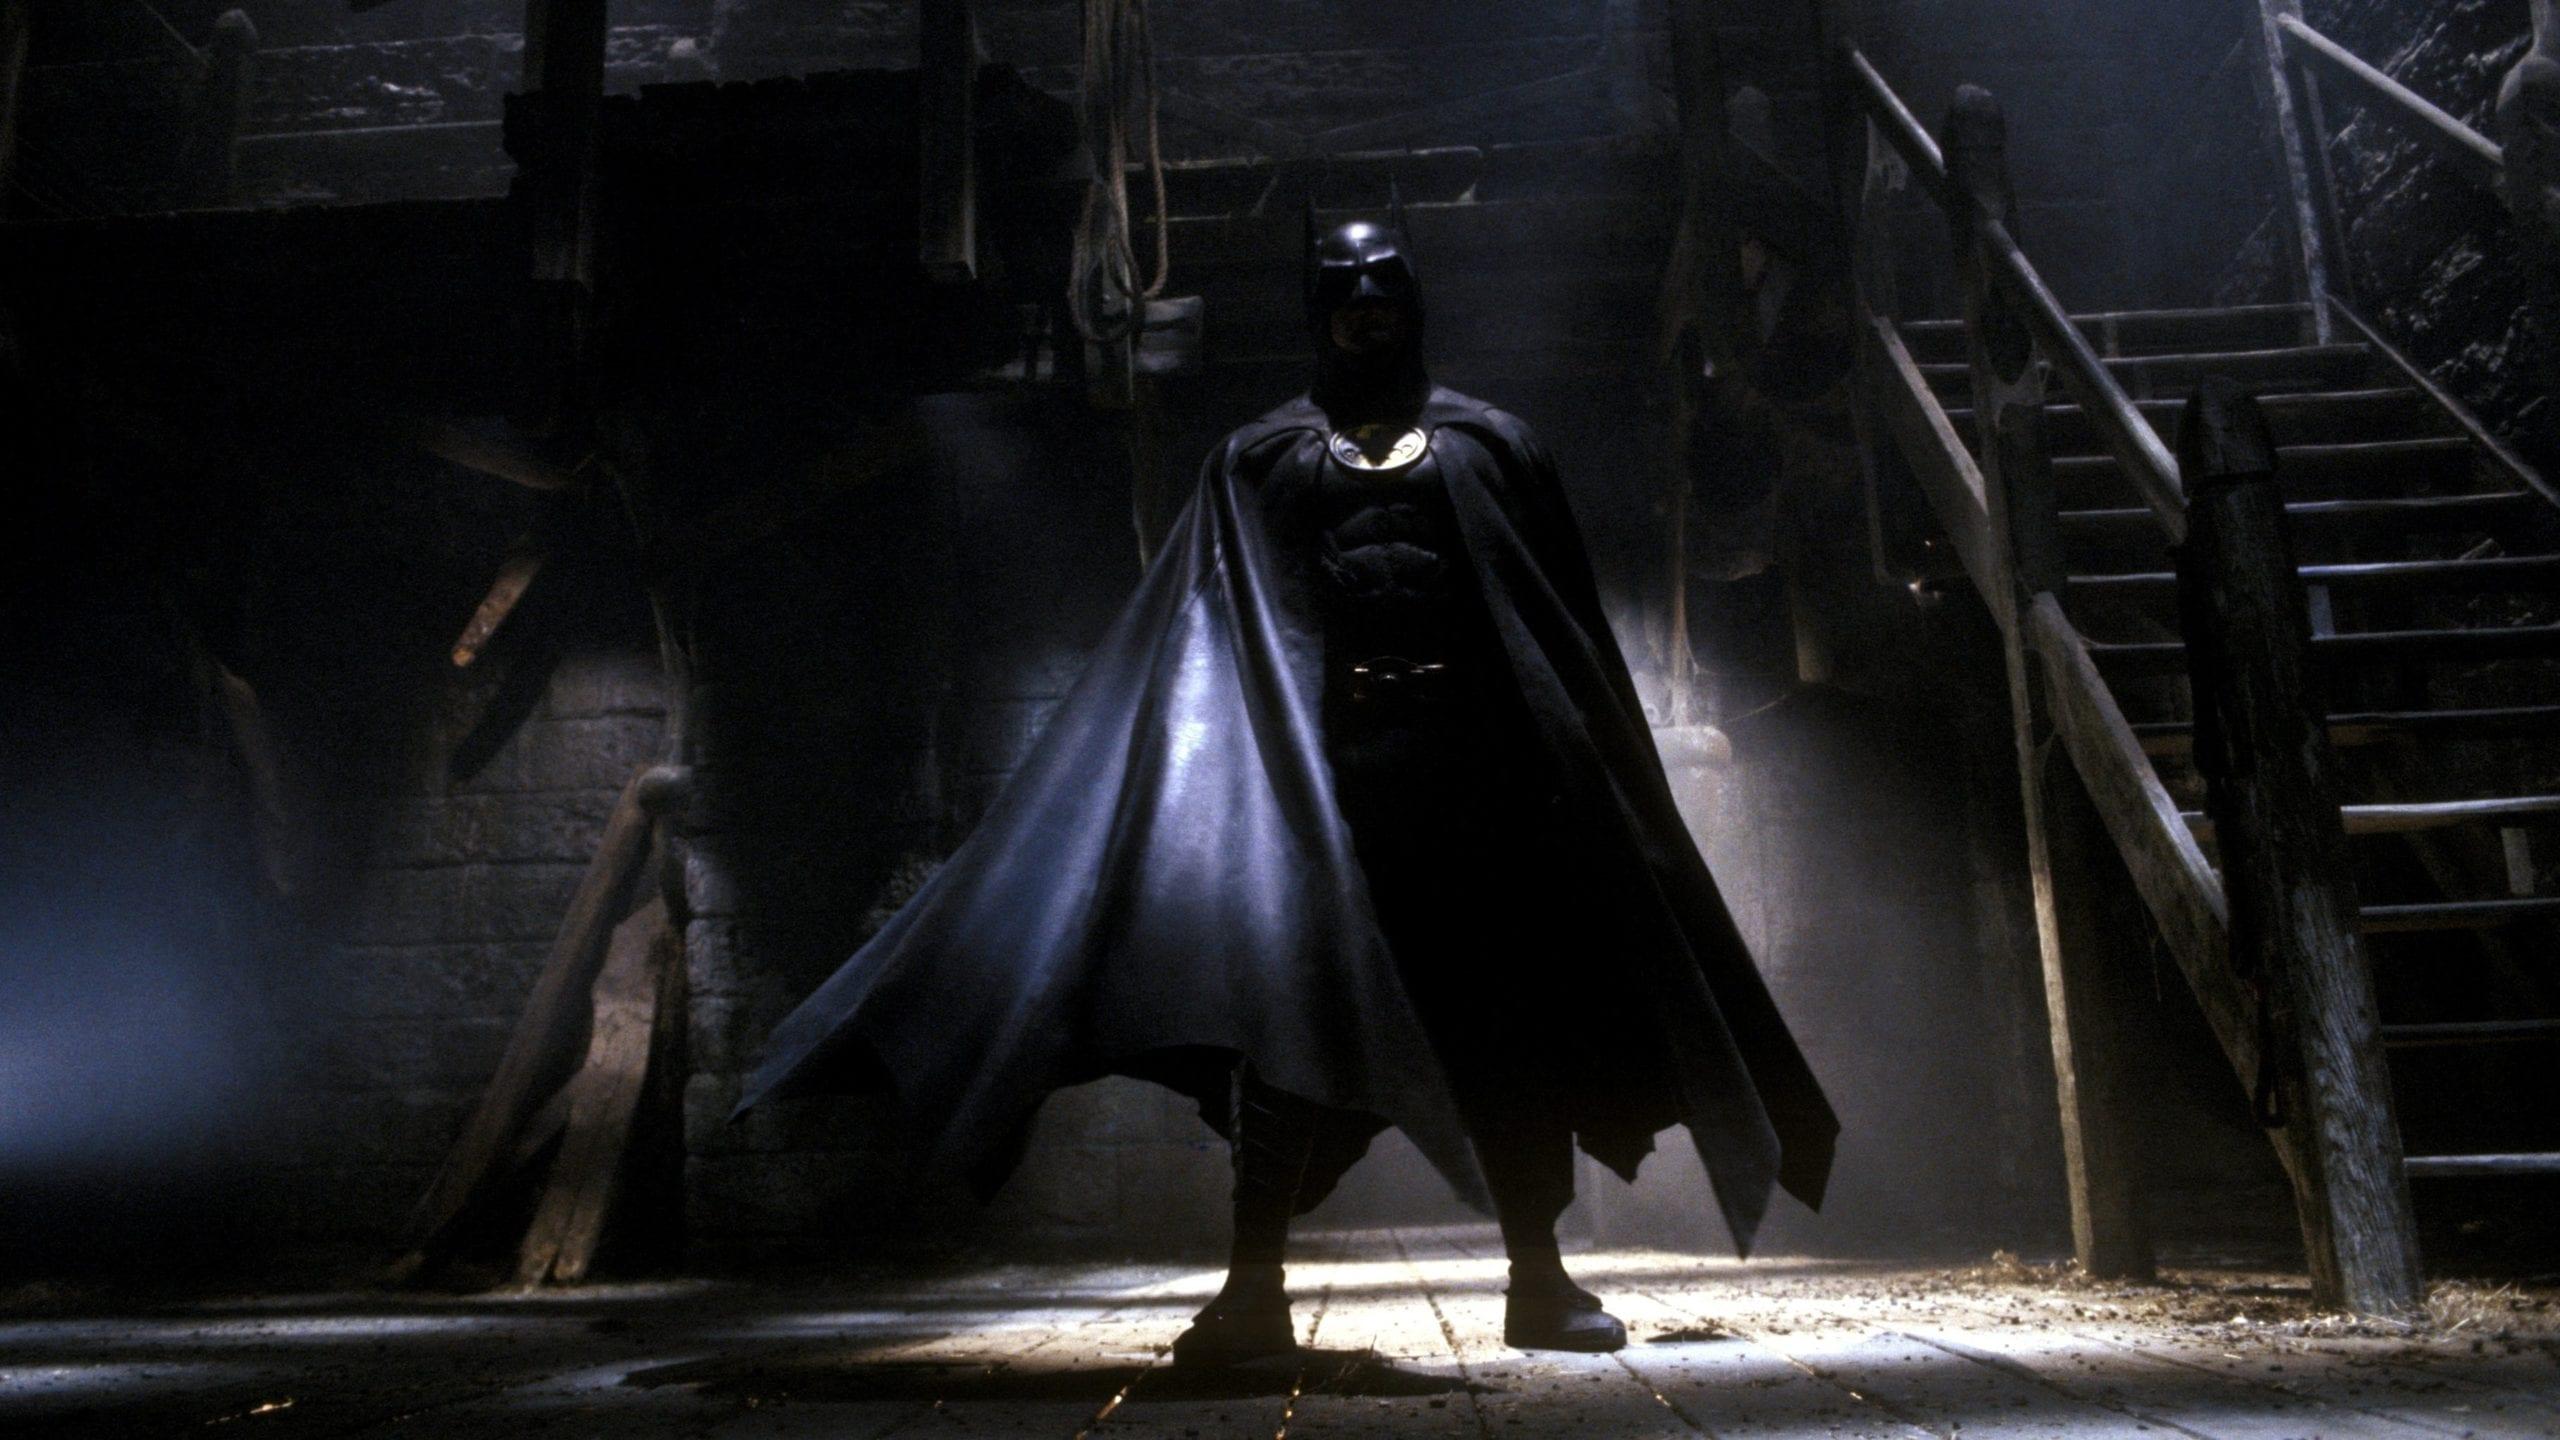 Batman, cape, The Flash